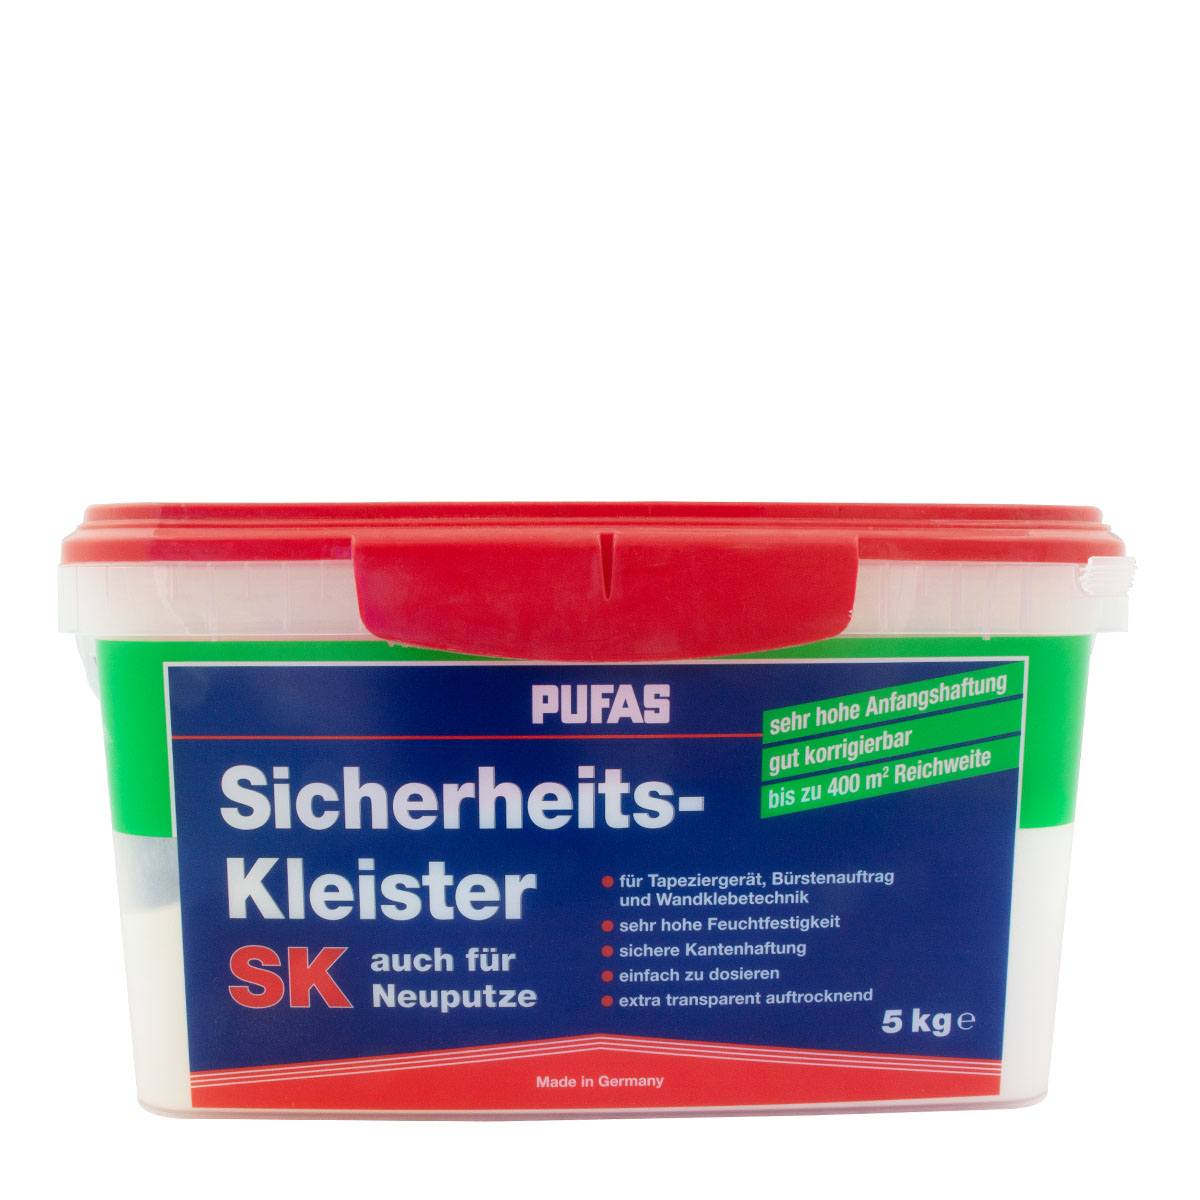 Pufas Sicherheits-Kleister SK 5 Kg, Tapetenkleister